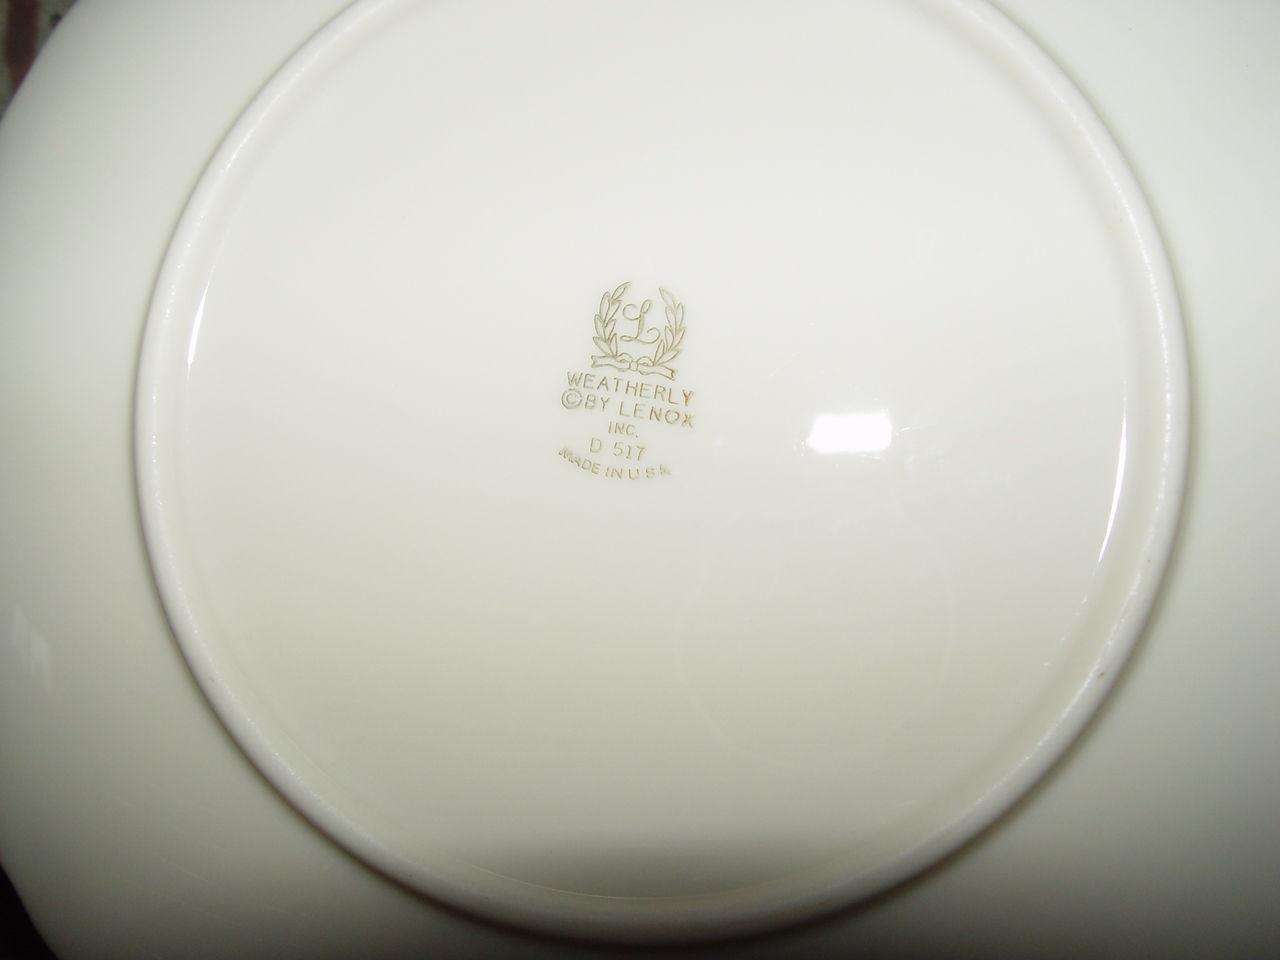 rogaska crystal vase patterns of back n time antiques antiques page in elegant weatherly lenox fine china